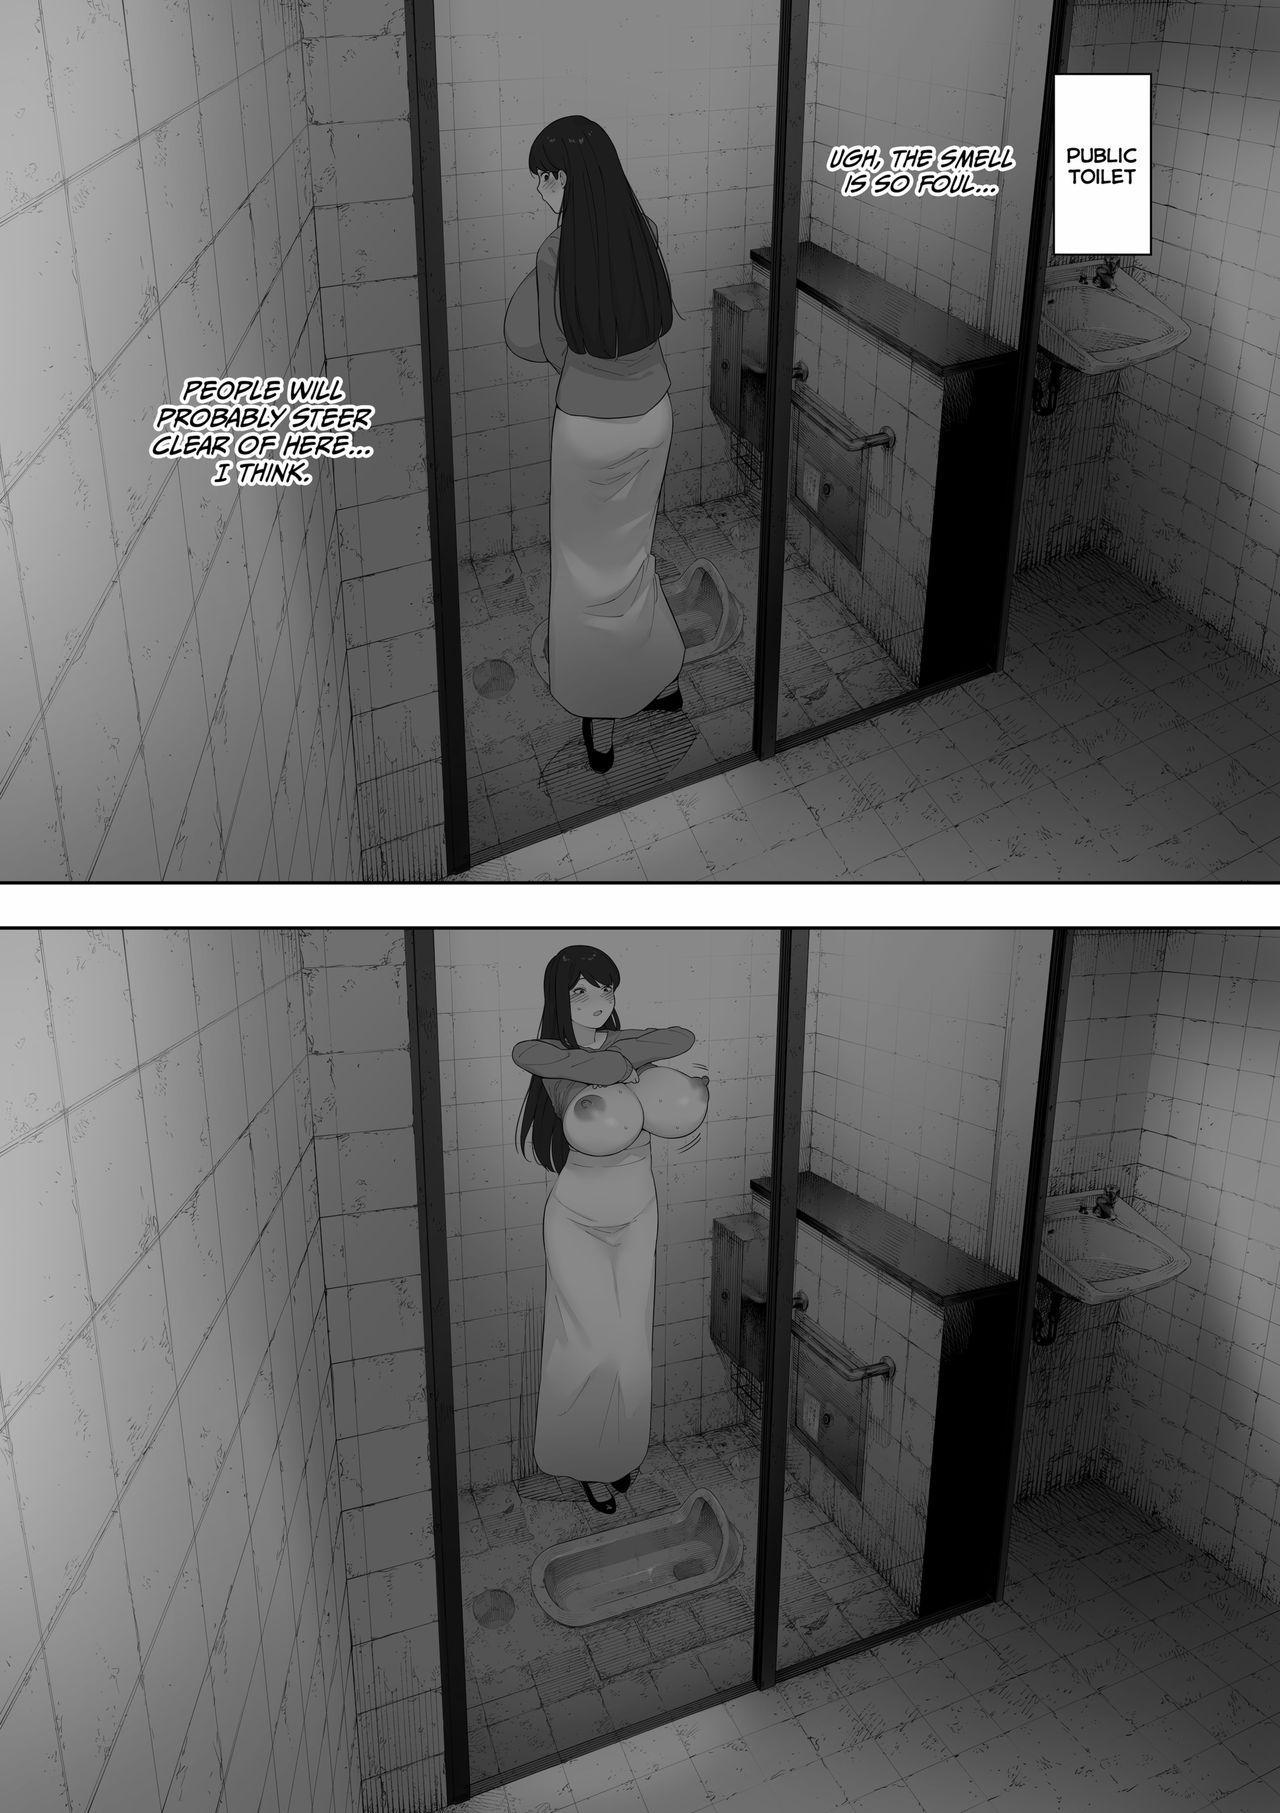 [NT Labo (NT Robo)] Aisai, Doui no Ue, Netorare Roshutsu | [NT Labo(NT Robo)] Cucked With_My Consent My Exhibitionist Wife [English] 8